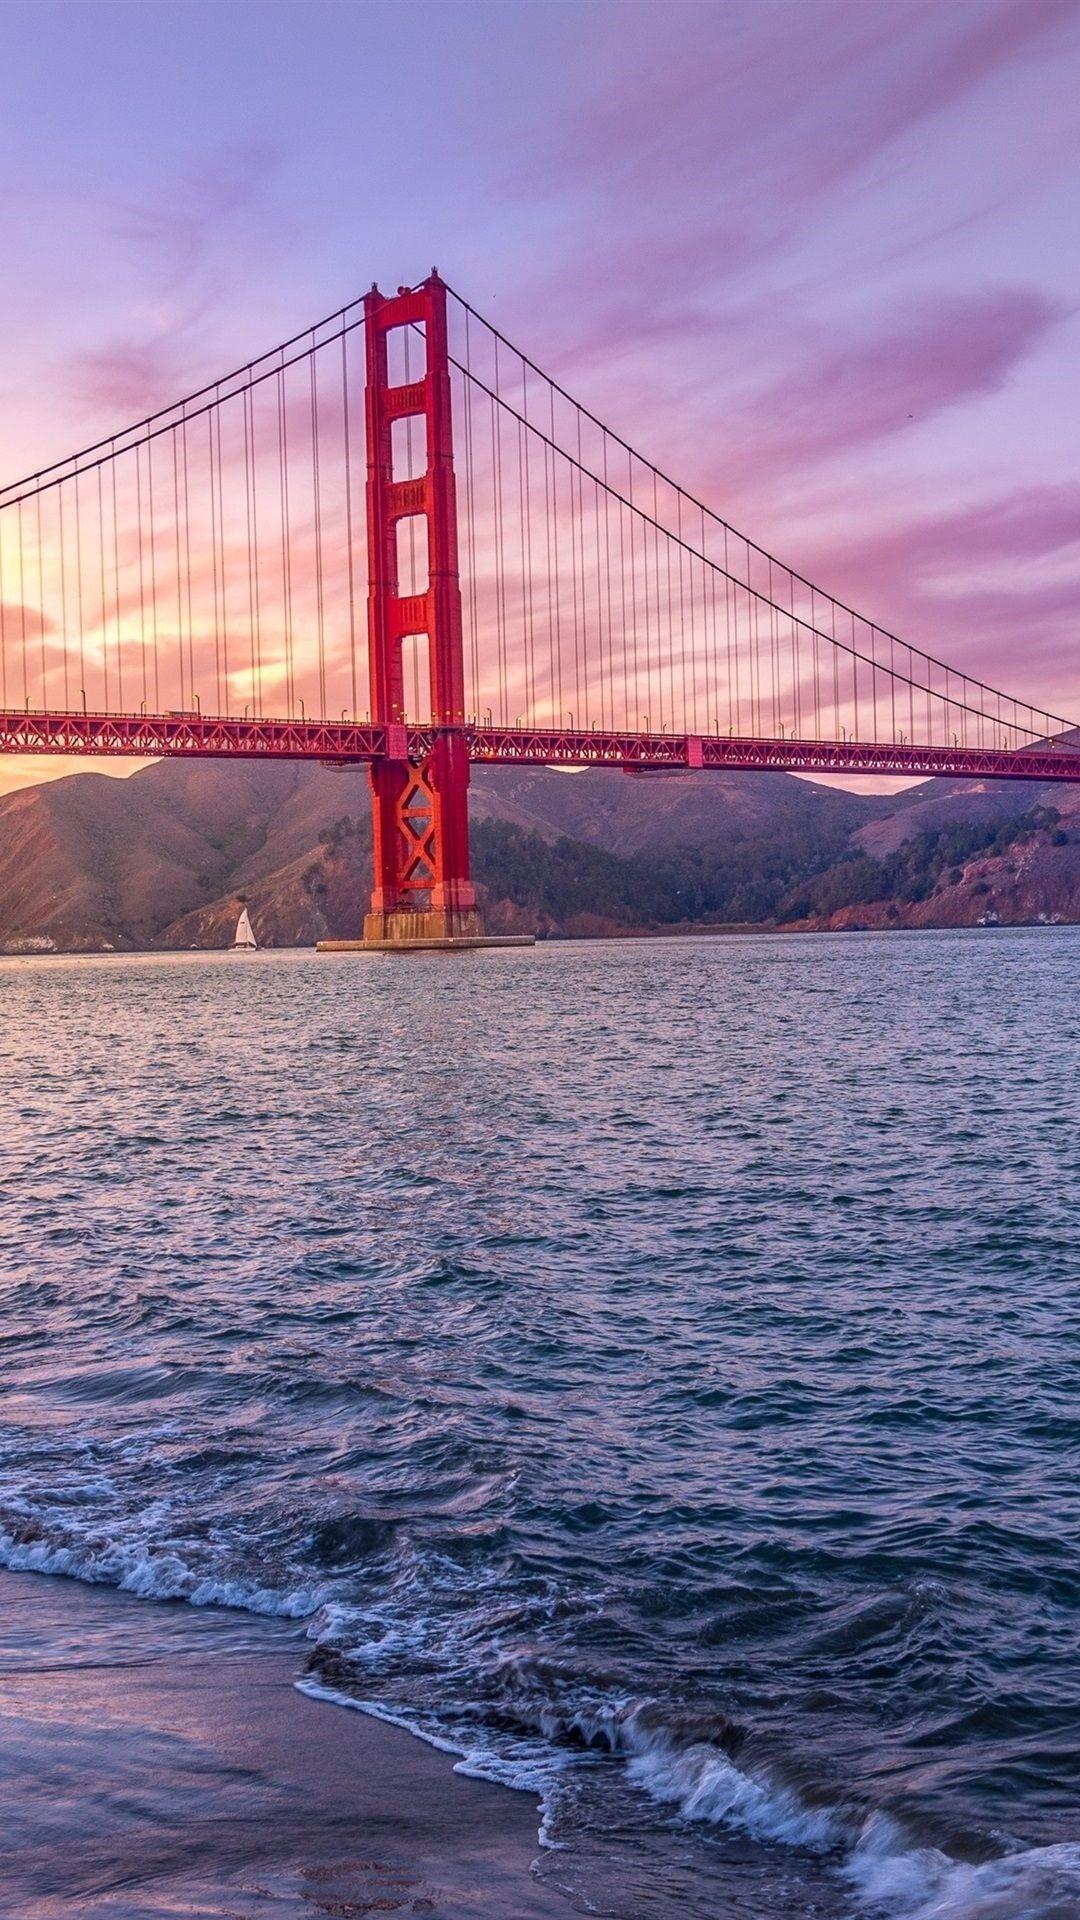 Golden Gate Bridge wallpaper for iphone